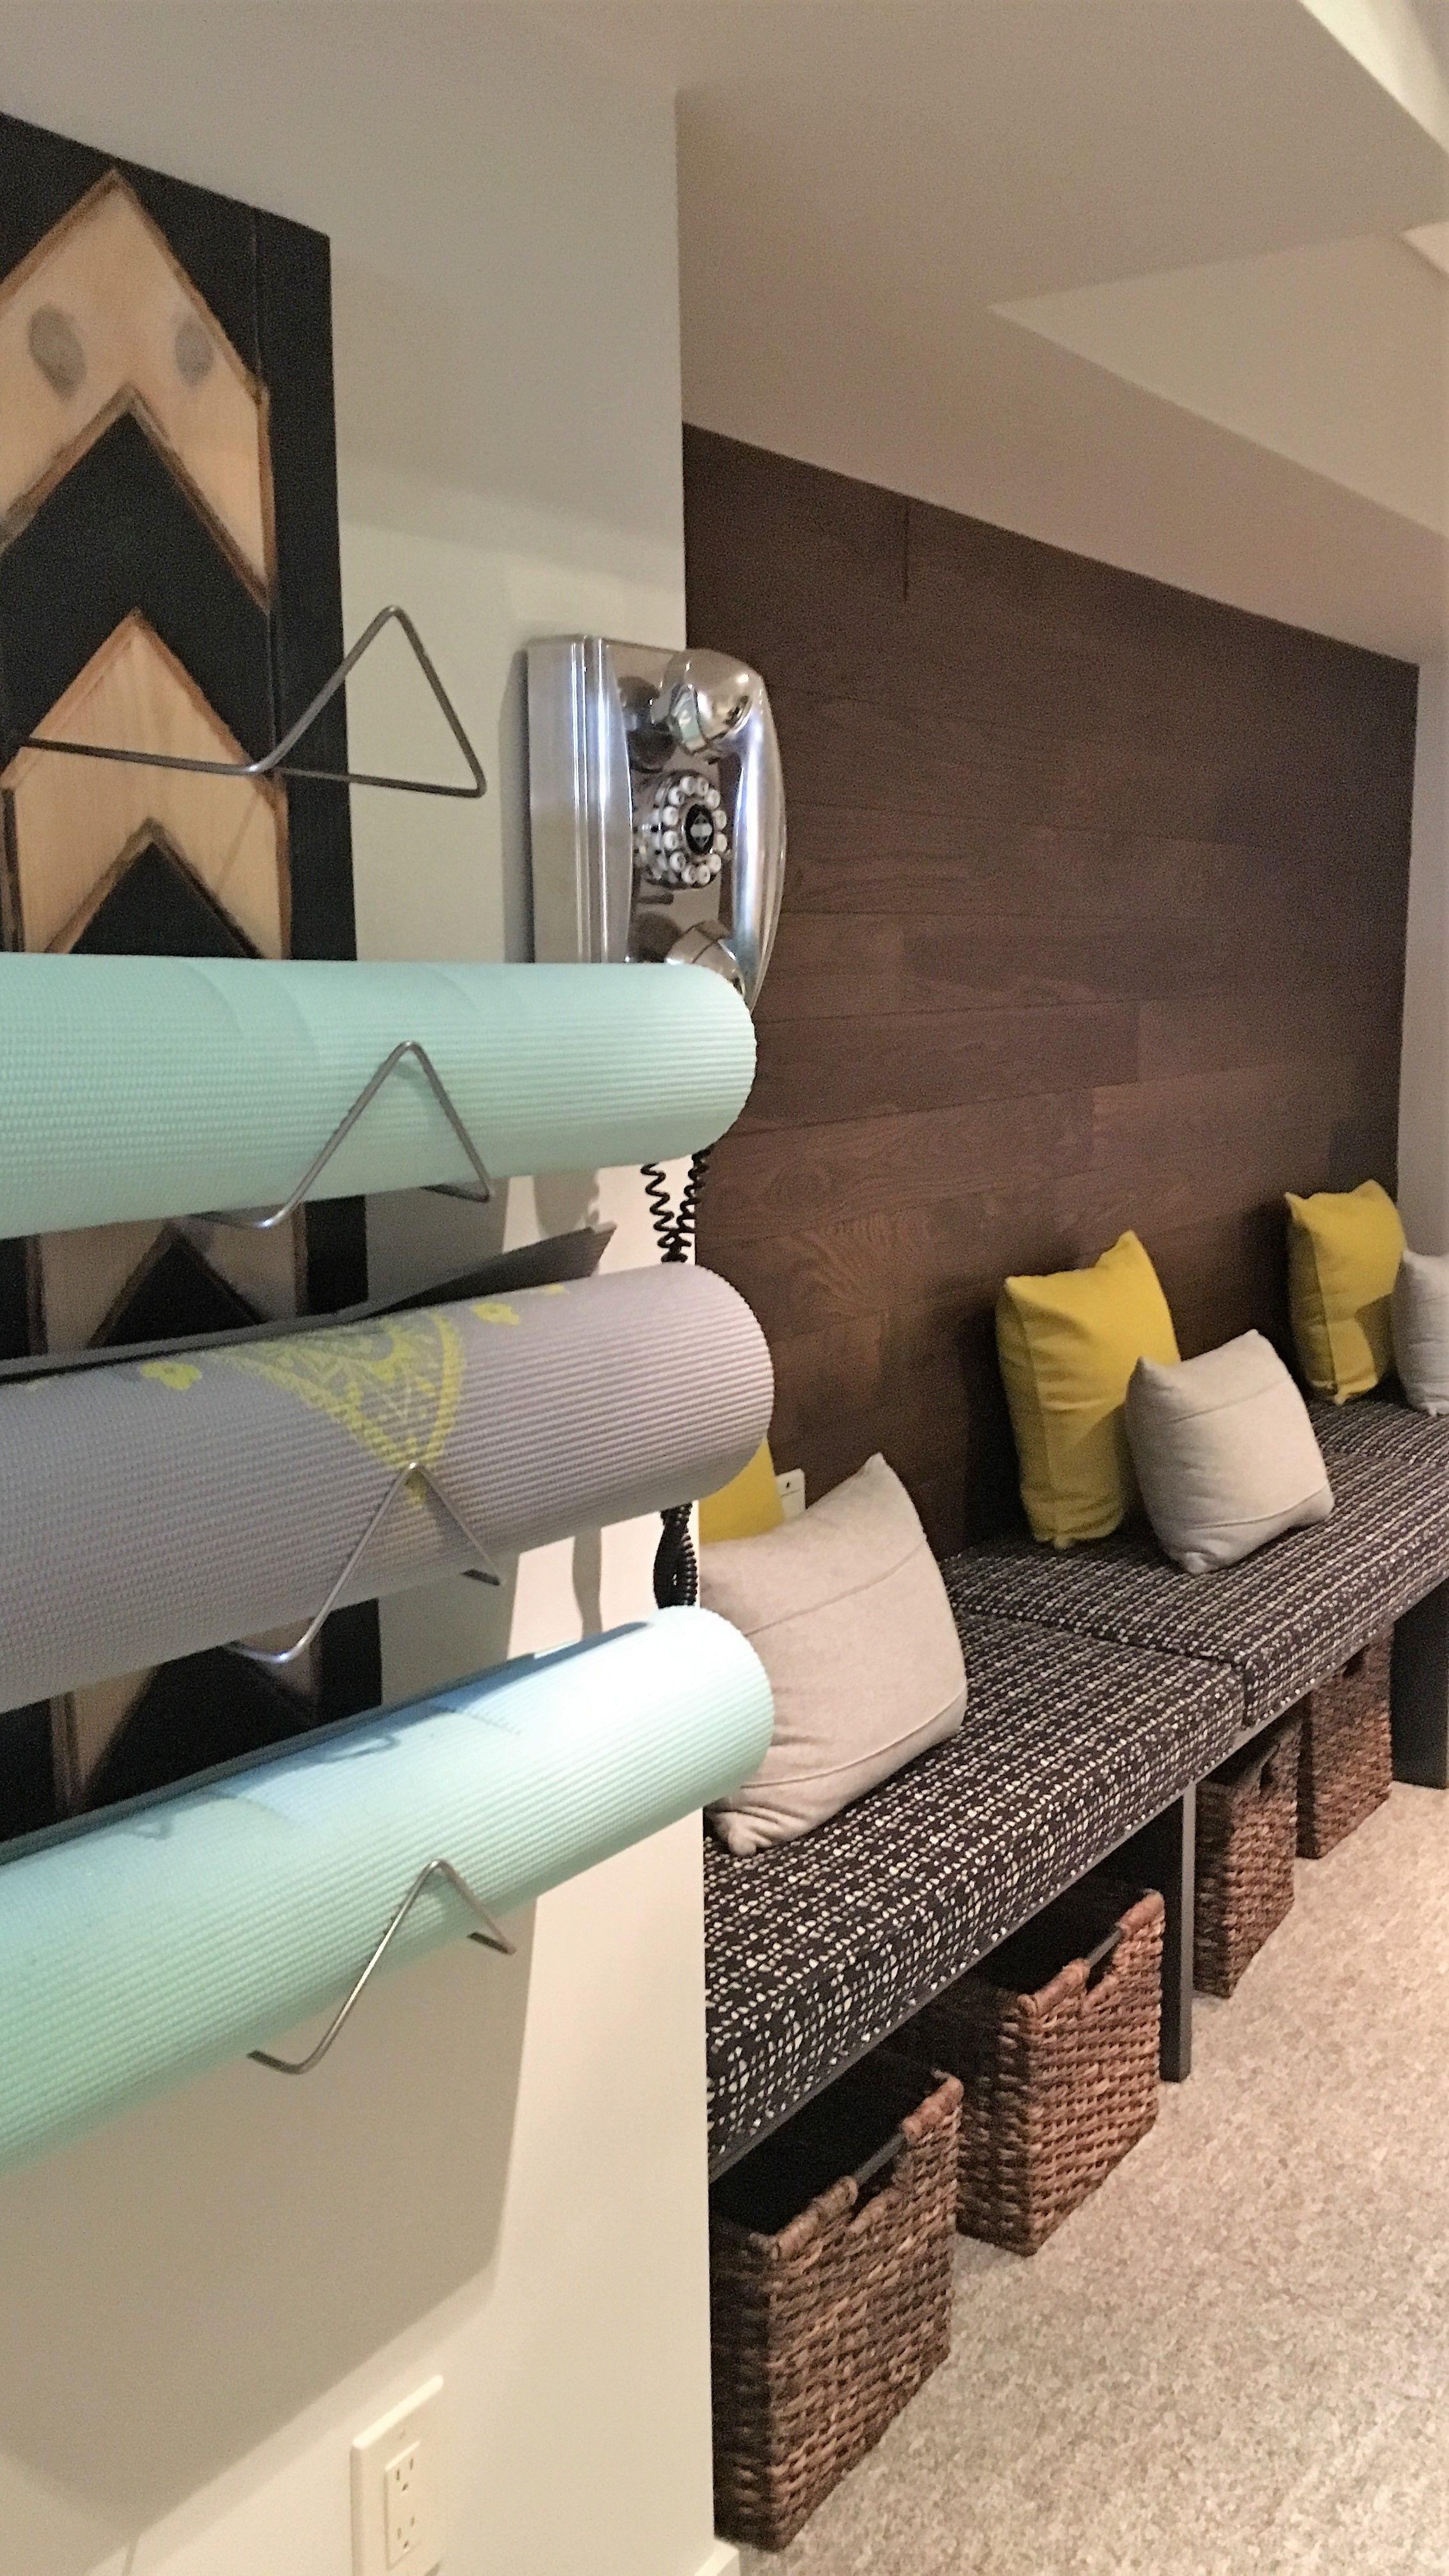 Modern Home Gym Decor Yoga Mat Holder Custom Cushions Gym Storage Solutions Stickwood Accent Wall Home Gym Decor Gym Room At Home Gym Wall Decor